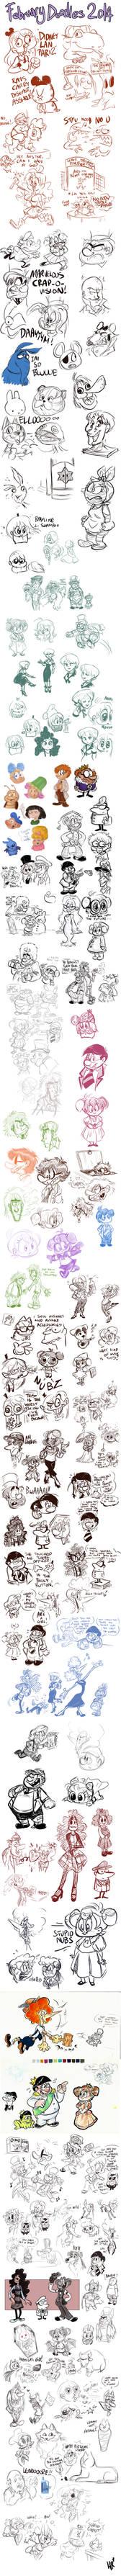 February Doodles 2014